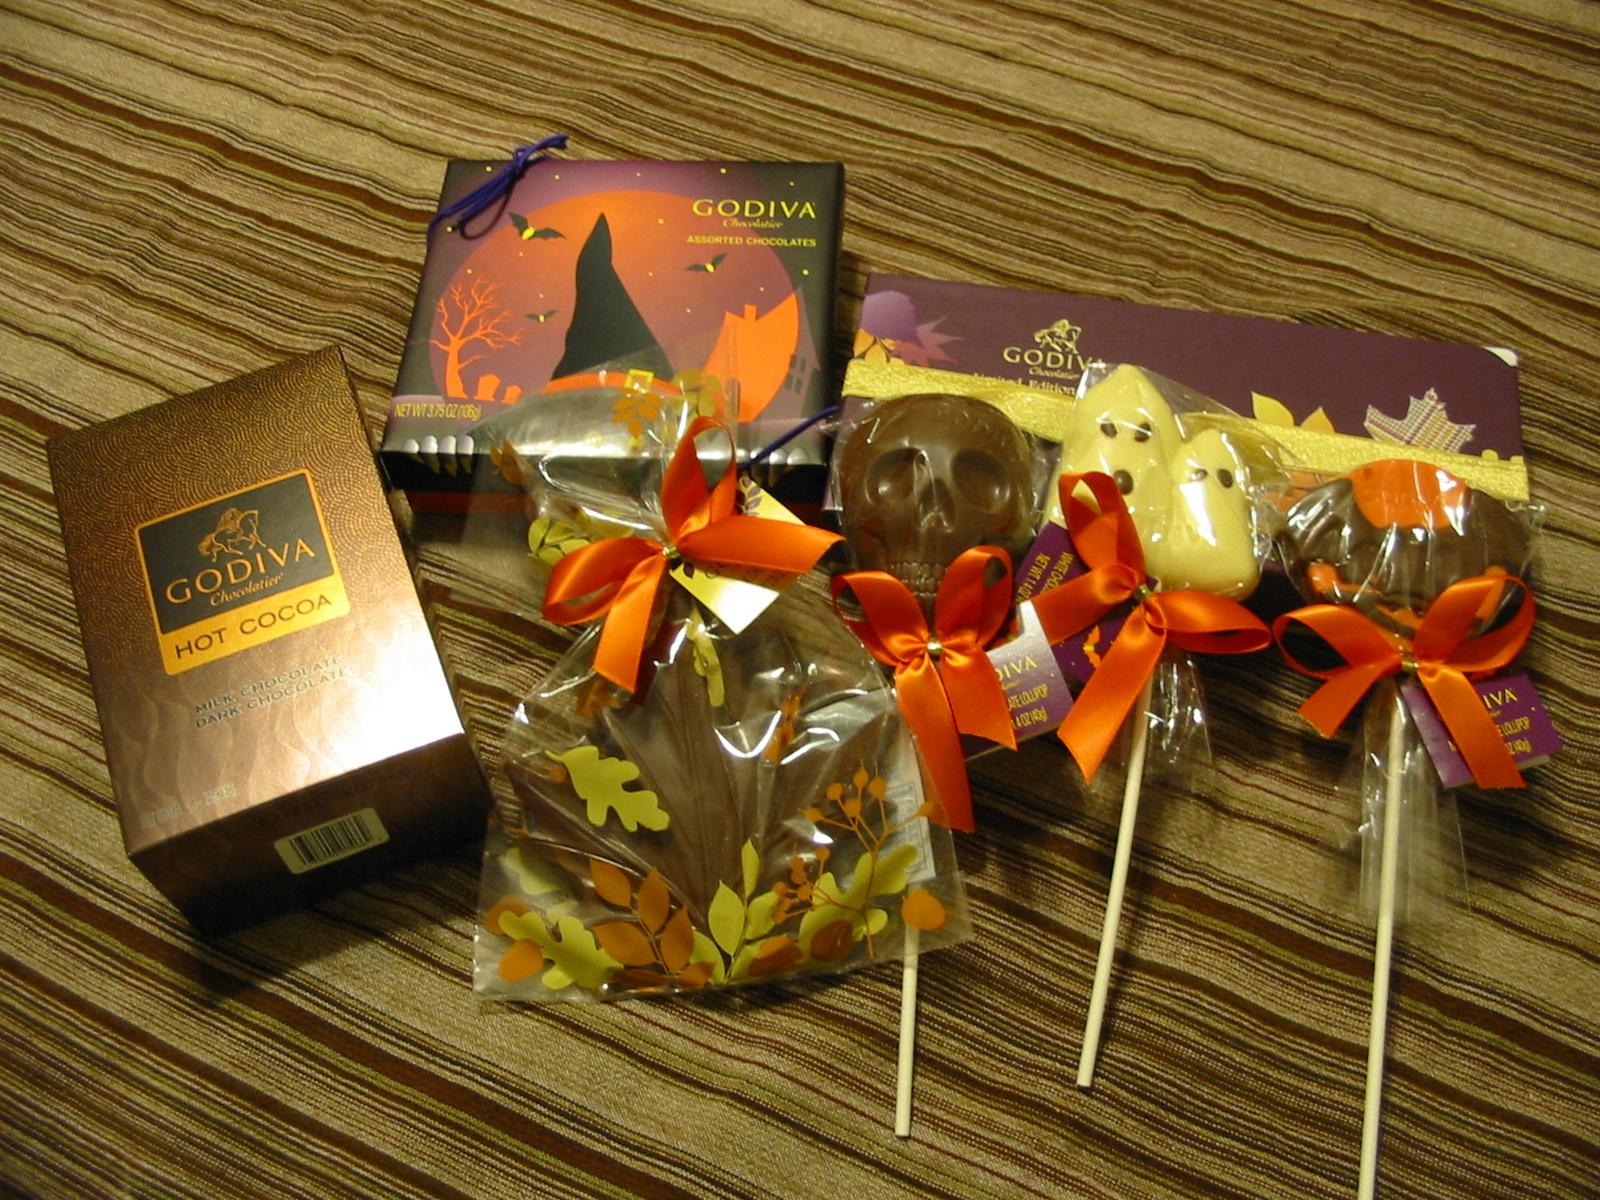 The Chocolate Cult: Godiva Halloween/Fall 2010